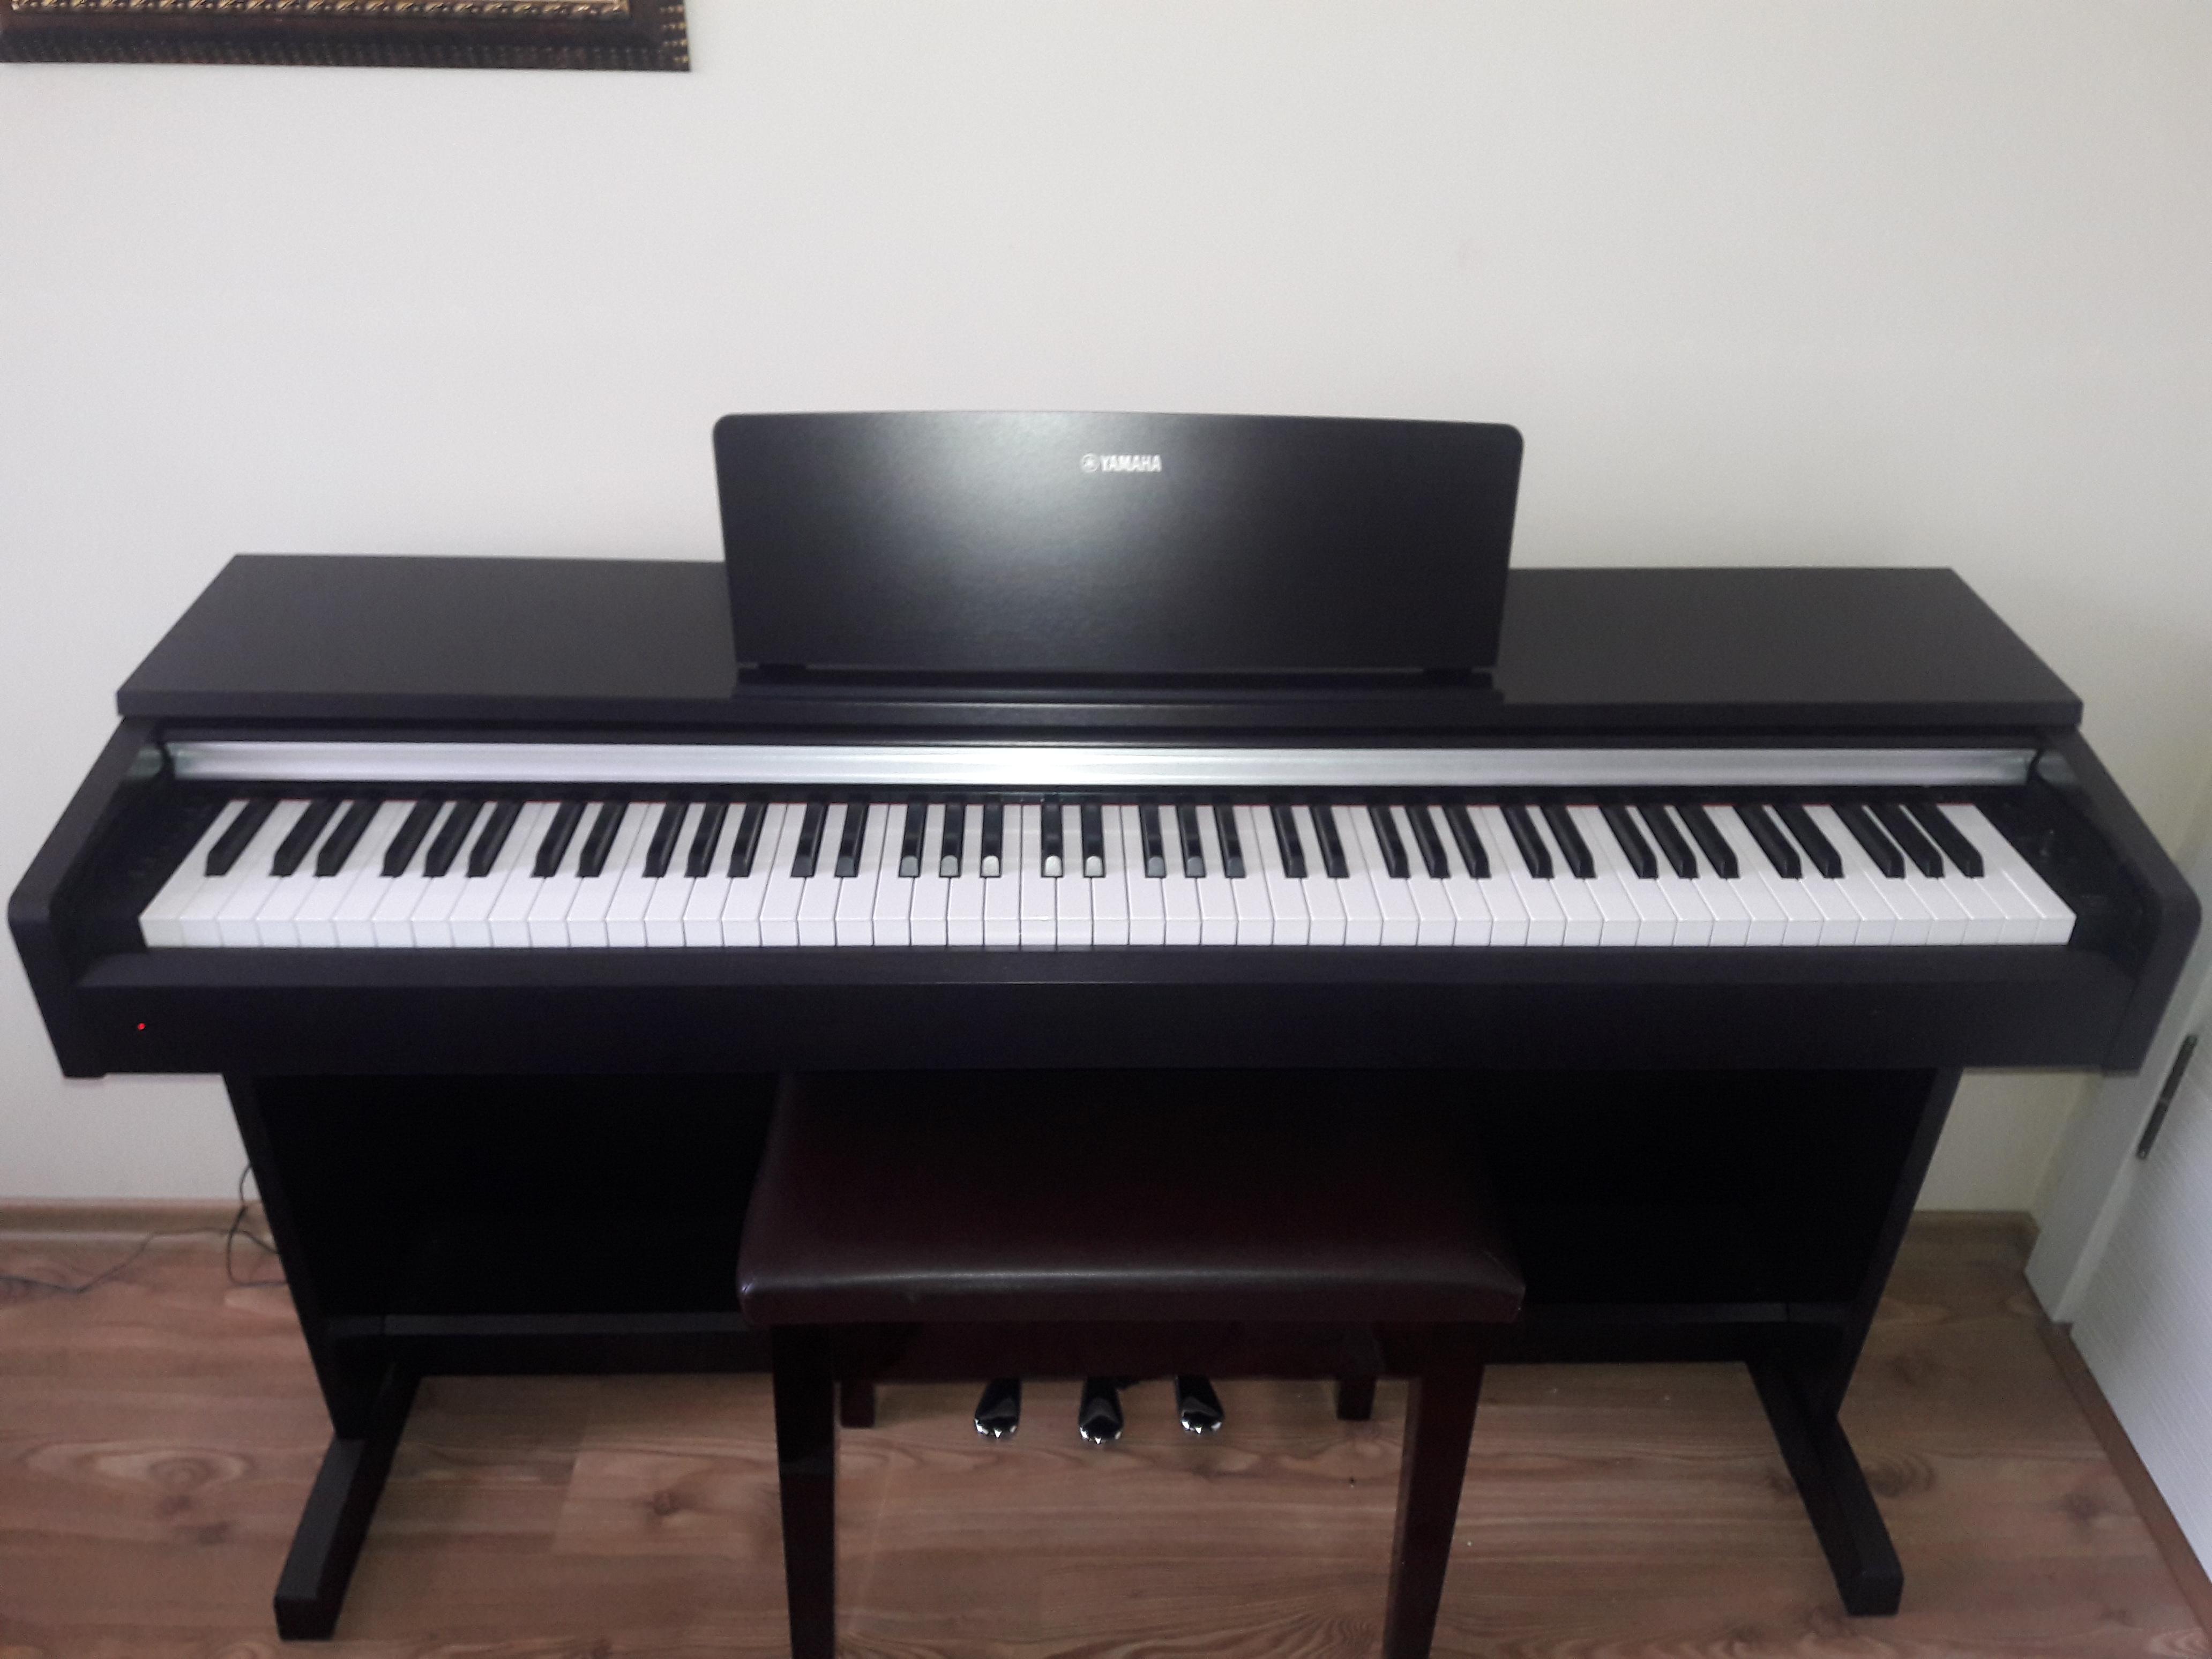 sat l k yamaha ar us ydp 142 piyano sayfa 1 0. Black Bedroom Furniture Sets. Home Design Ideas